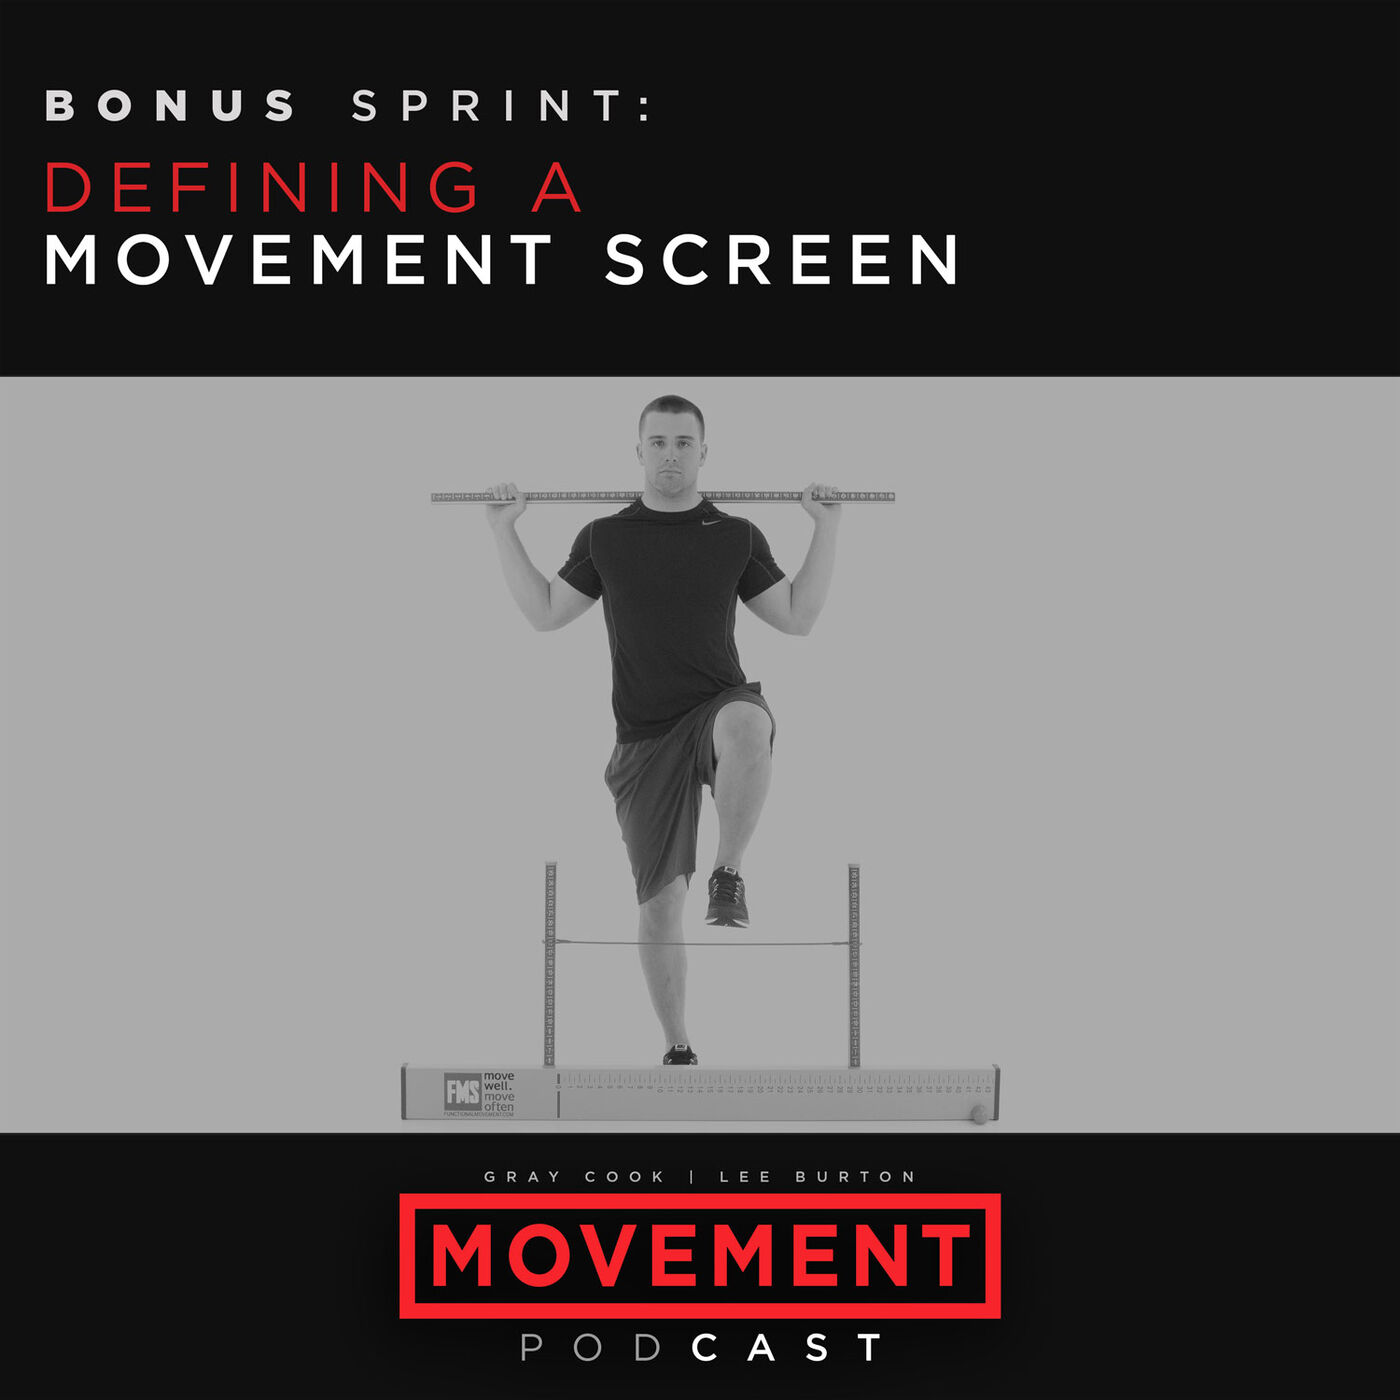 Bonus Sprint: Defining a Movement Screen